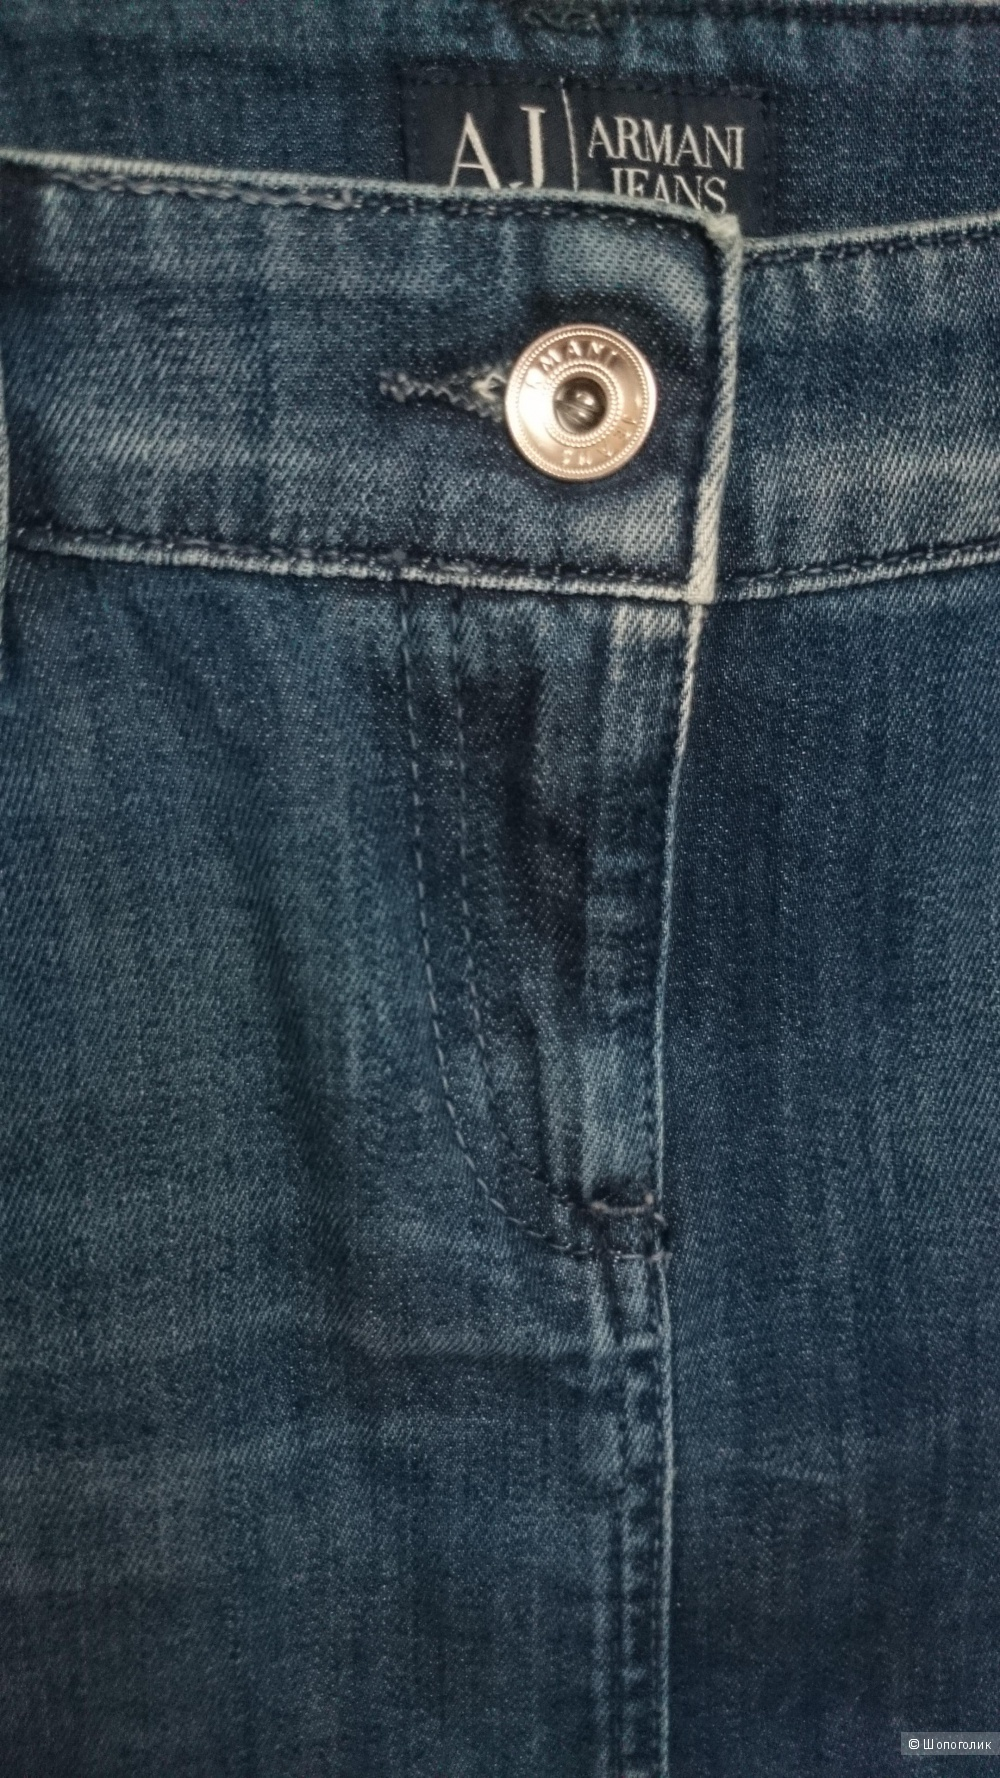 Джинсовая юбка Armani Jeans,  размер 42-46 (44I)